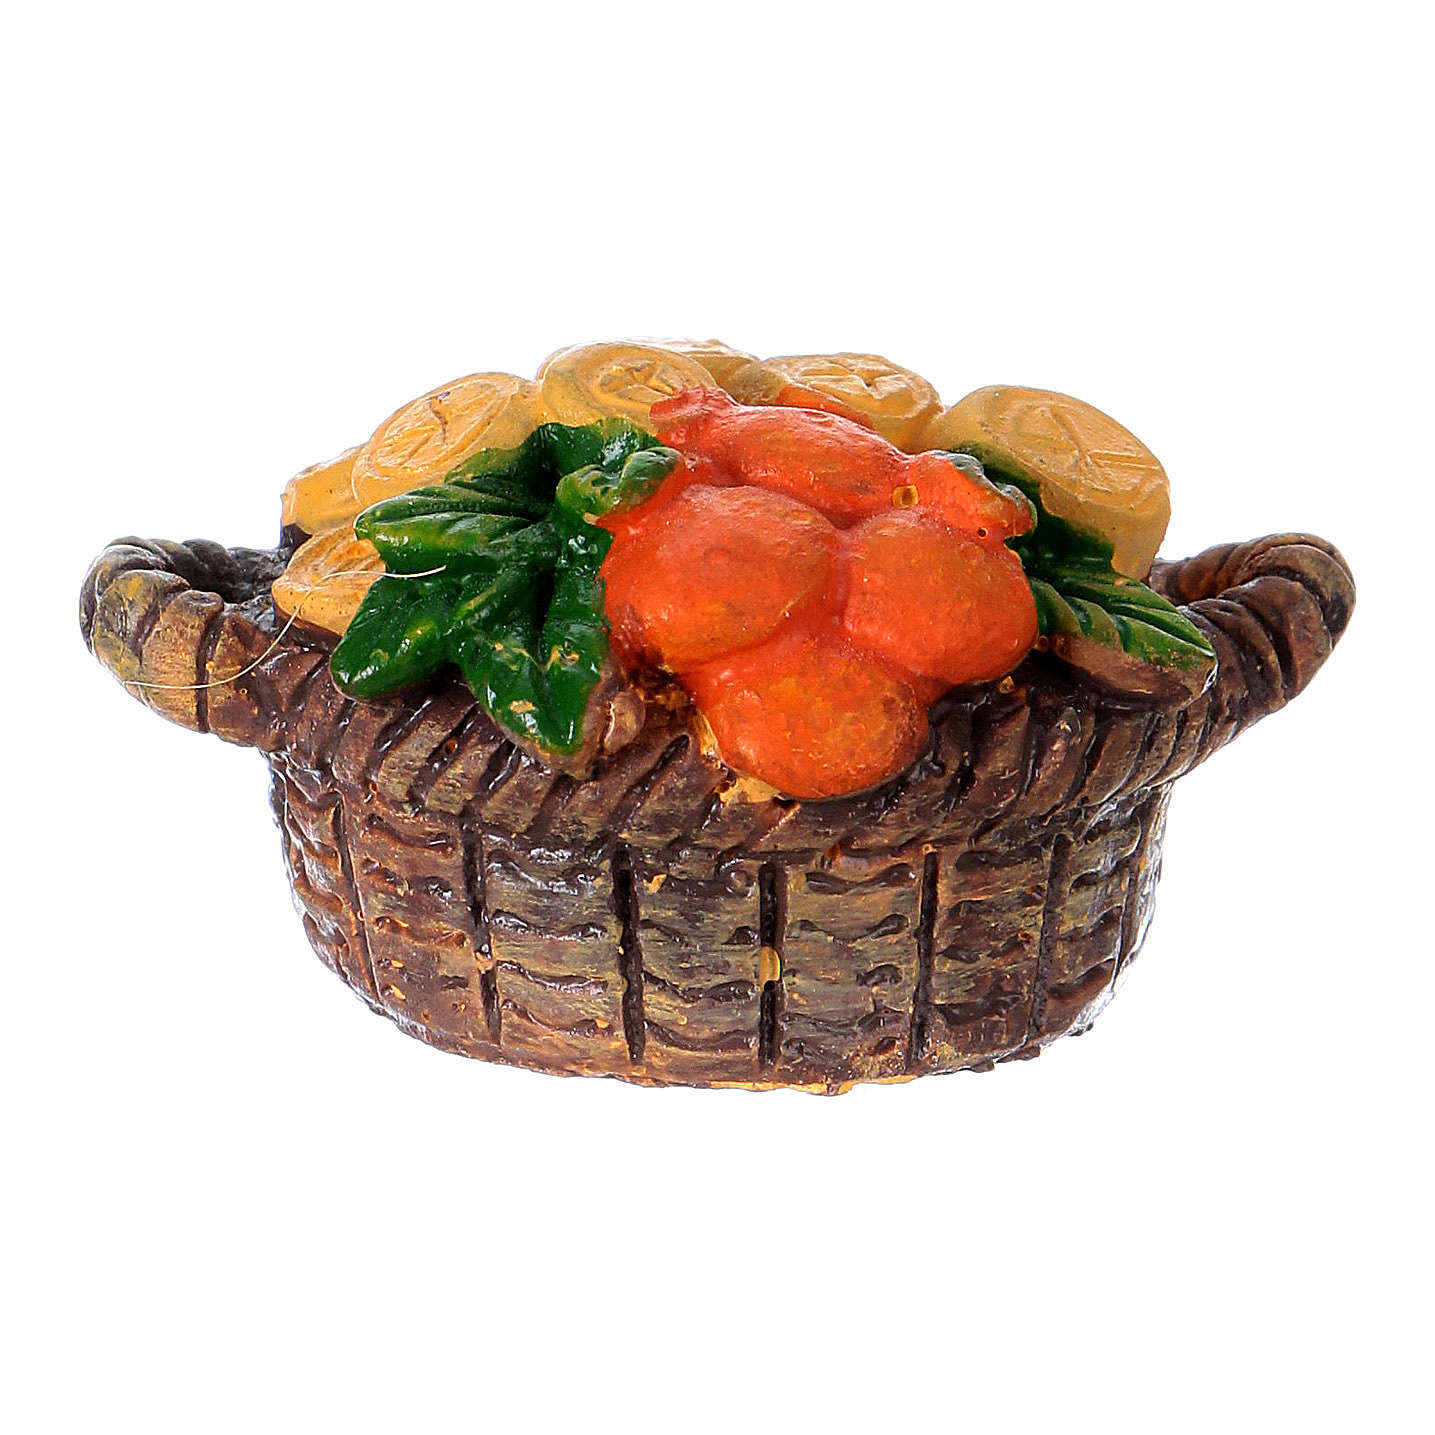 Cesto fruttivendolo in resina presepe Moranduzzo 10 cm 4